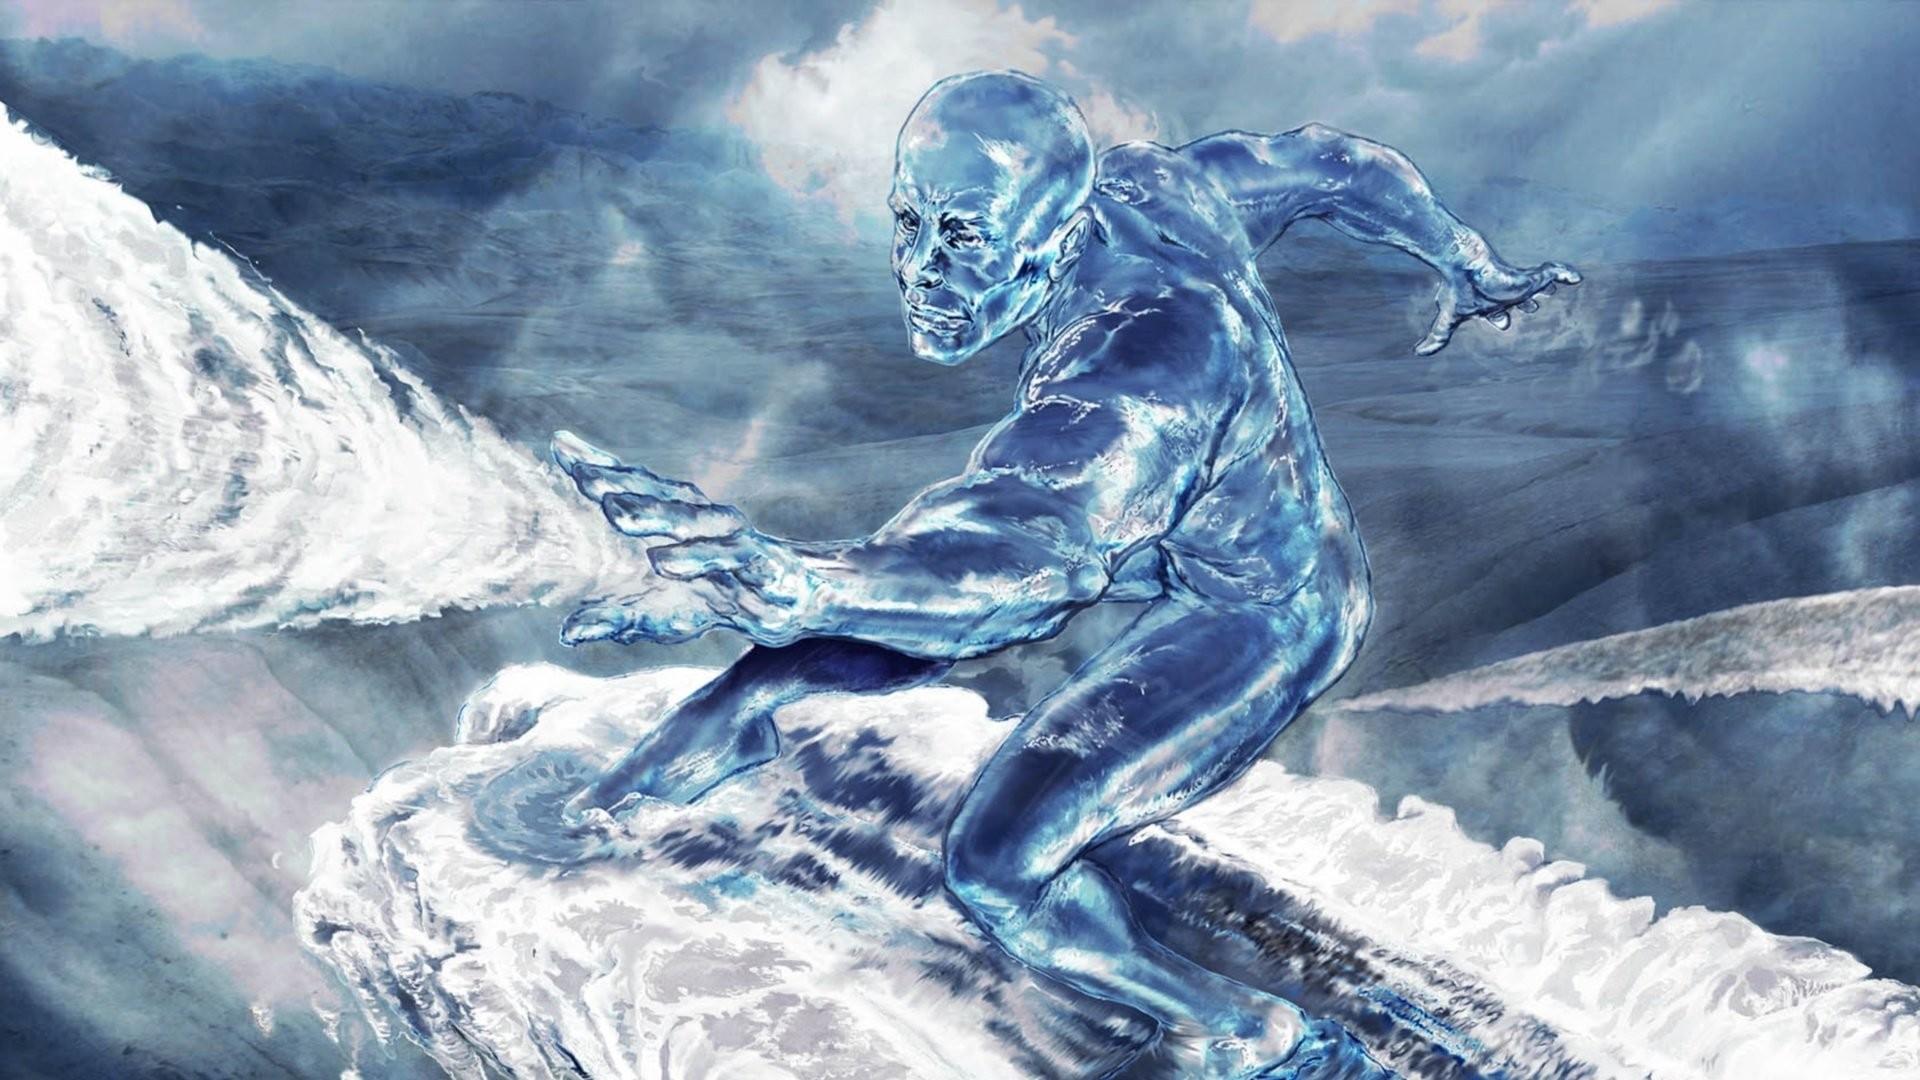 Silver Surfer Wallpaper High Resolution: Silver Surfer Wallpaper HD (59+ Images